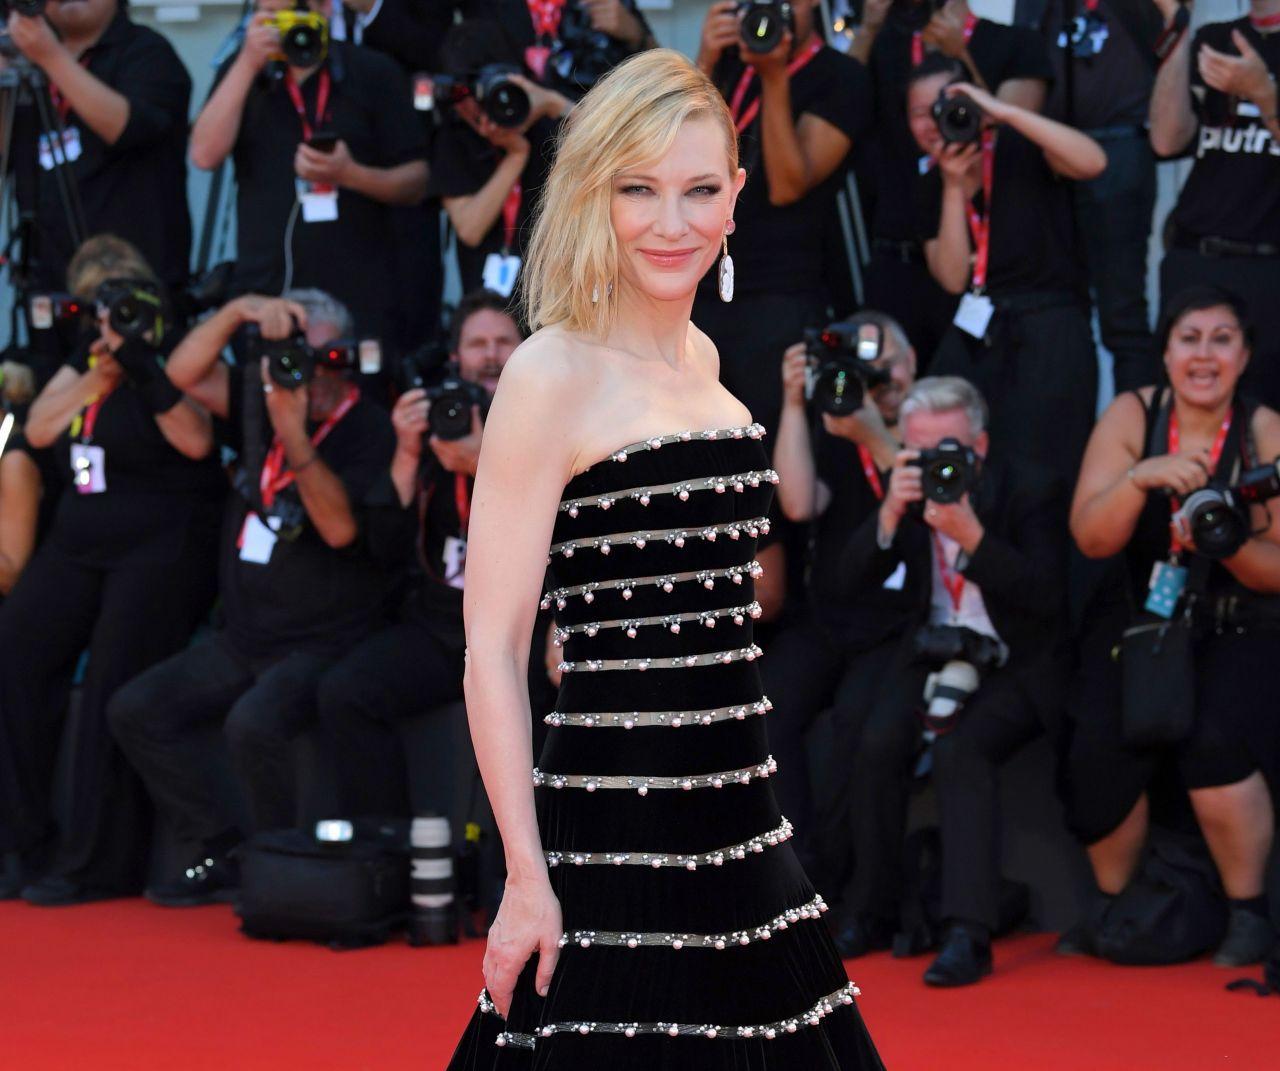 Cate Blanchett on Red Carpet – 'Joker' Screening at the 76th Venice International Film Festival in Venice